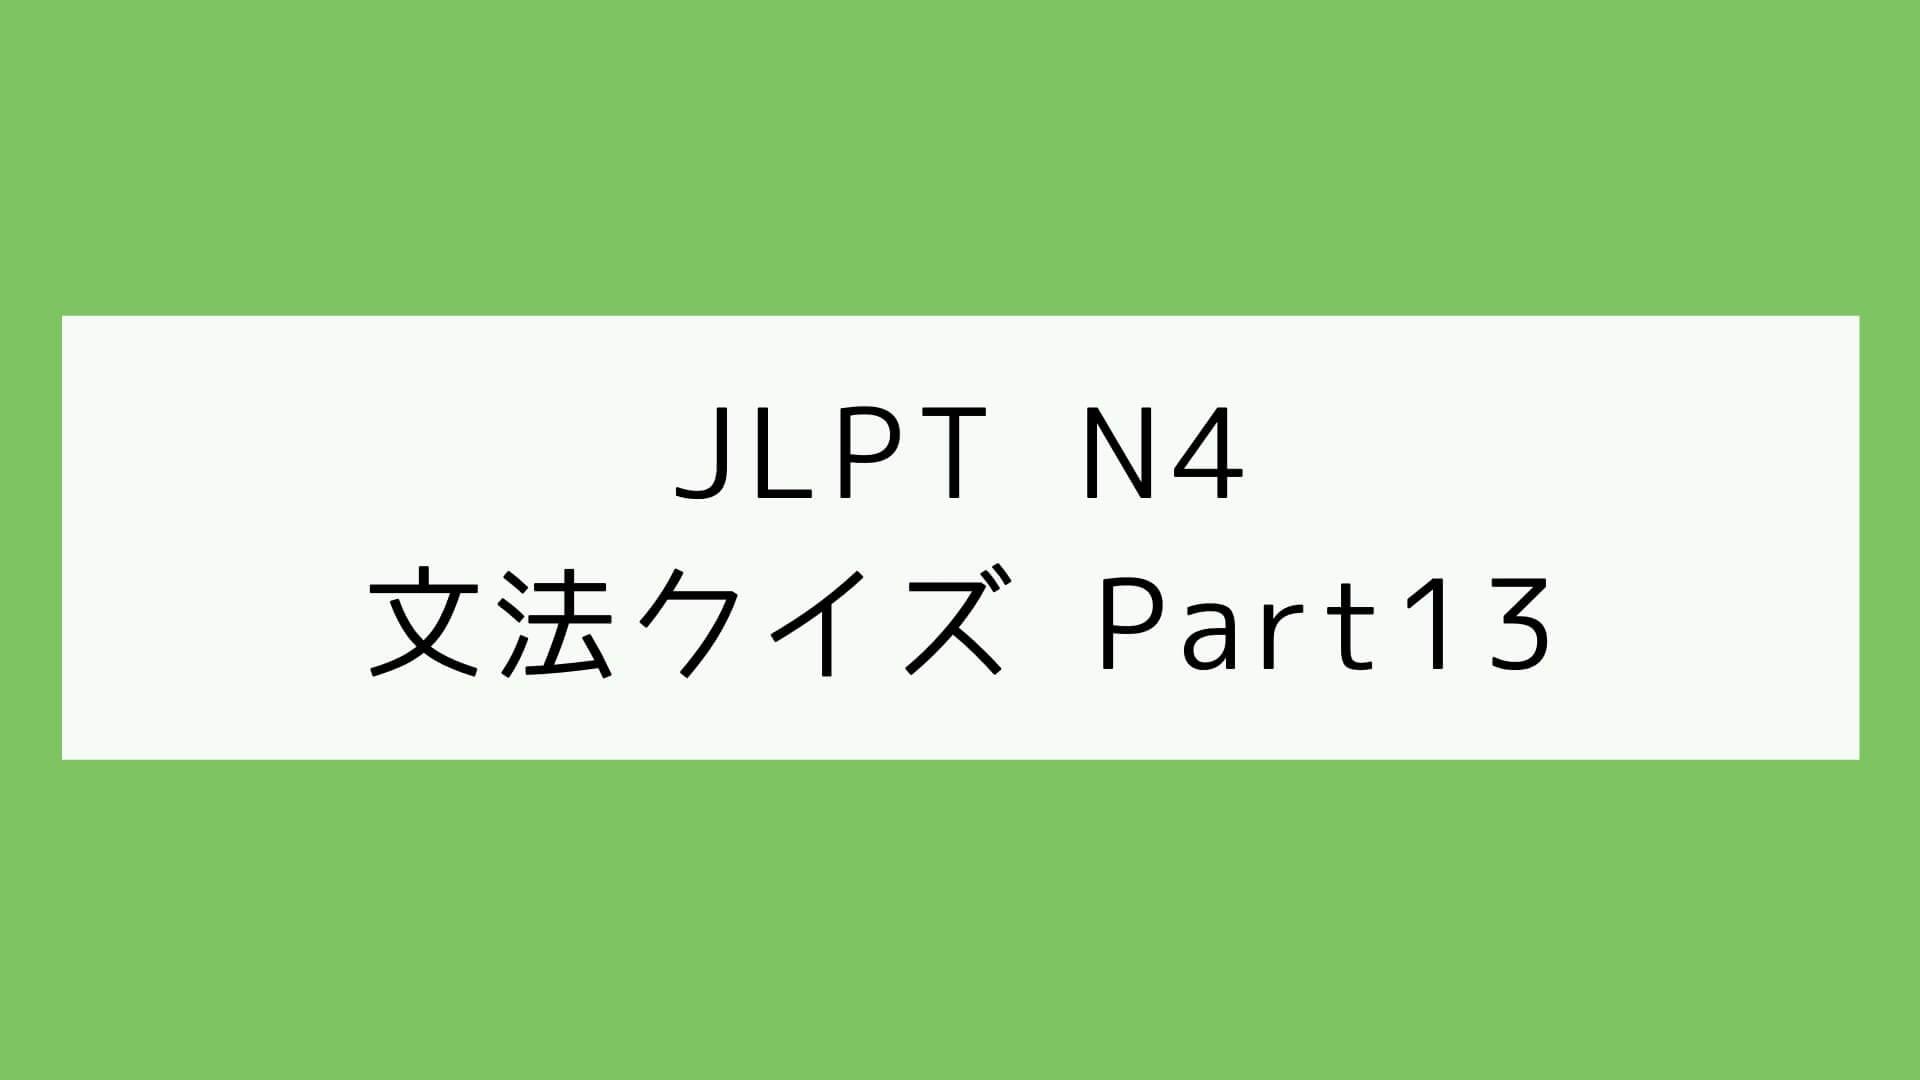 【JLPT N4】文法クイズ Part13